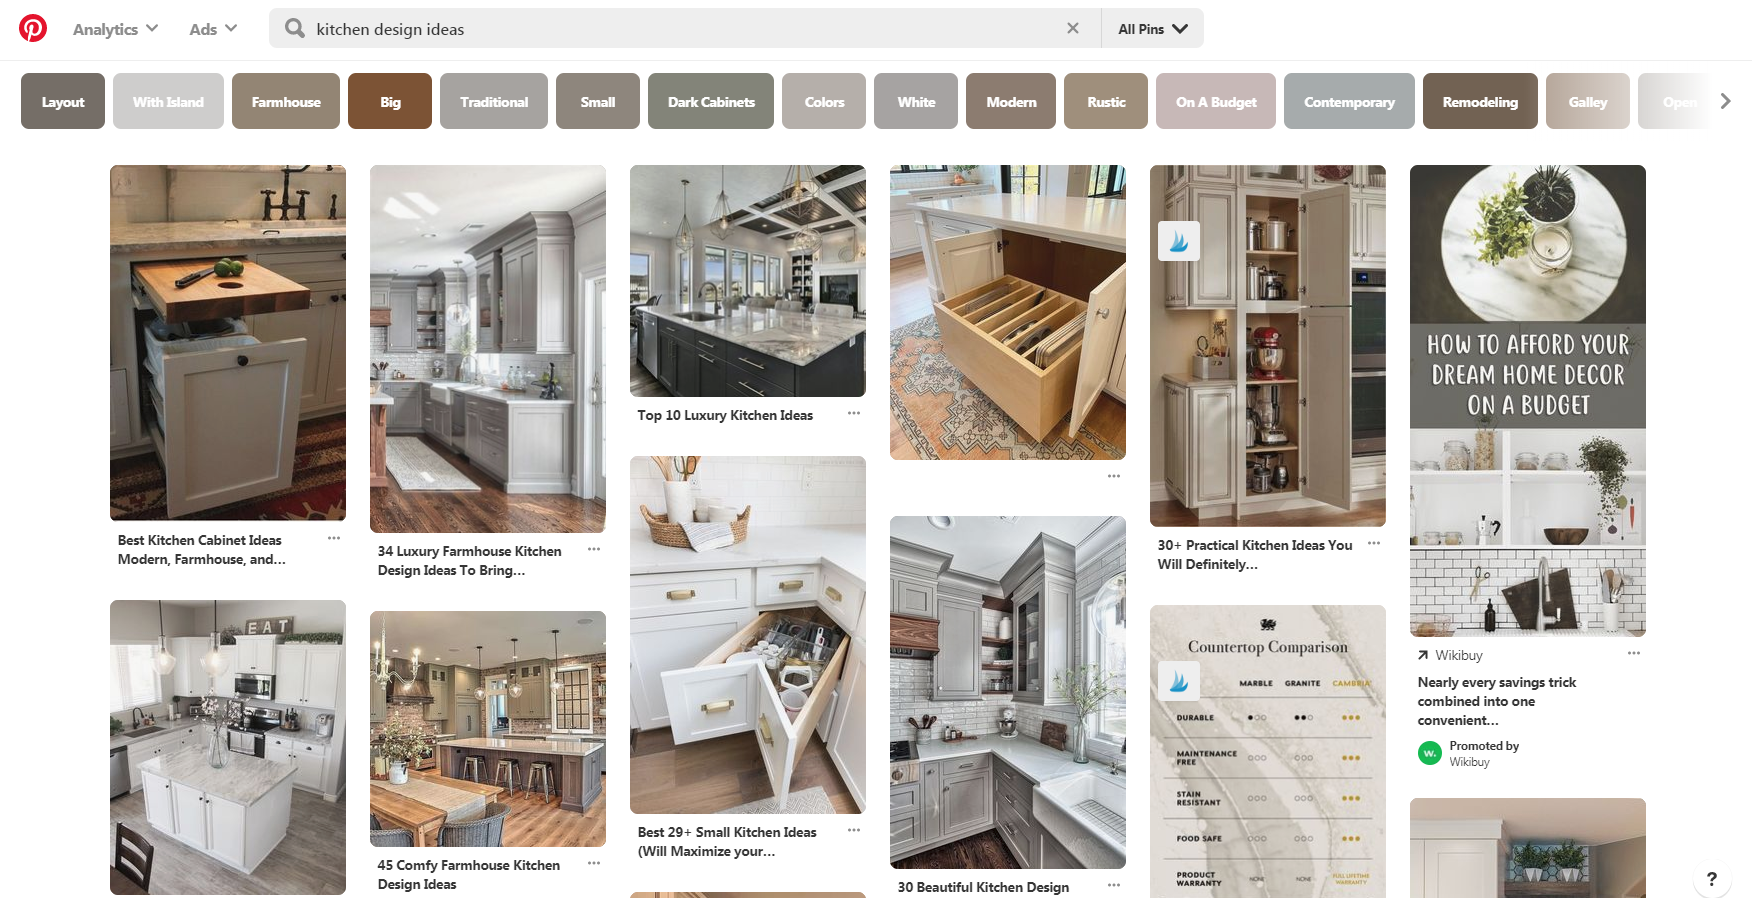 Pinterest Results for Kitchen Design Ideas